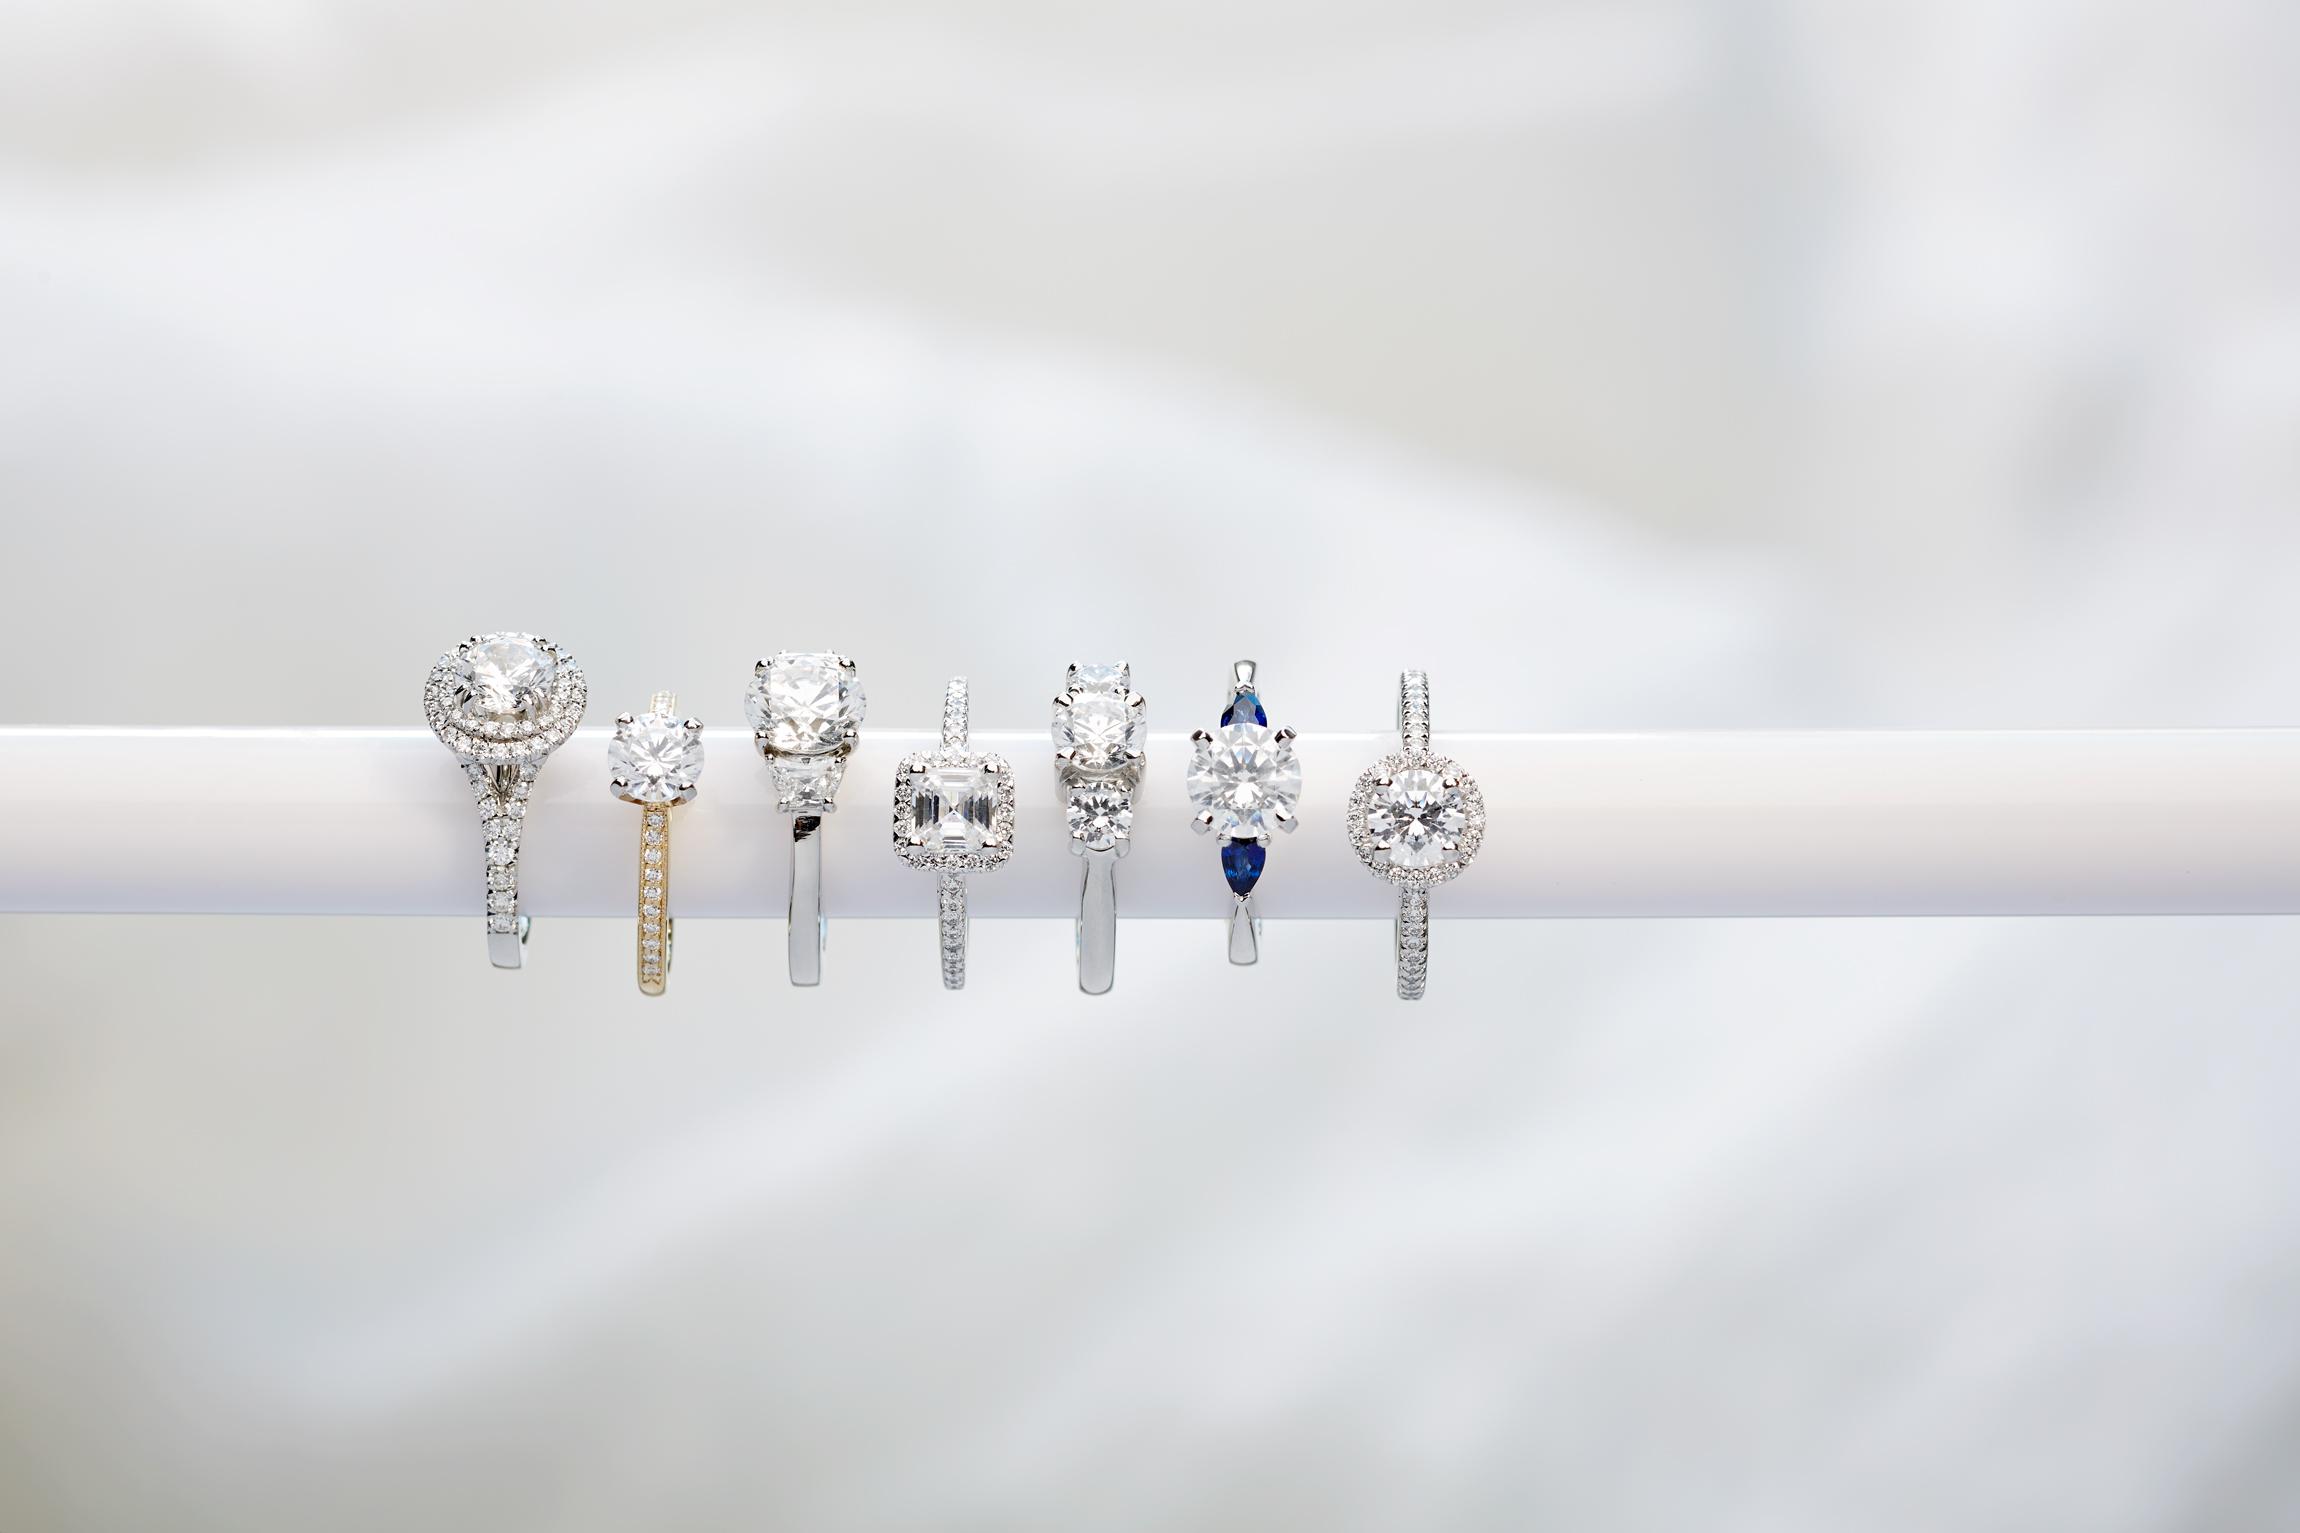 Product_photography_Jewelry_Derek_Israelsen_012_Bar_Rings.jpg